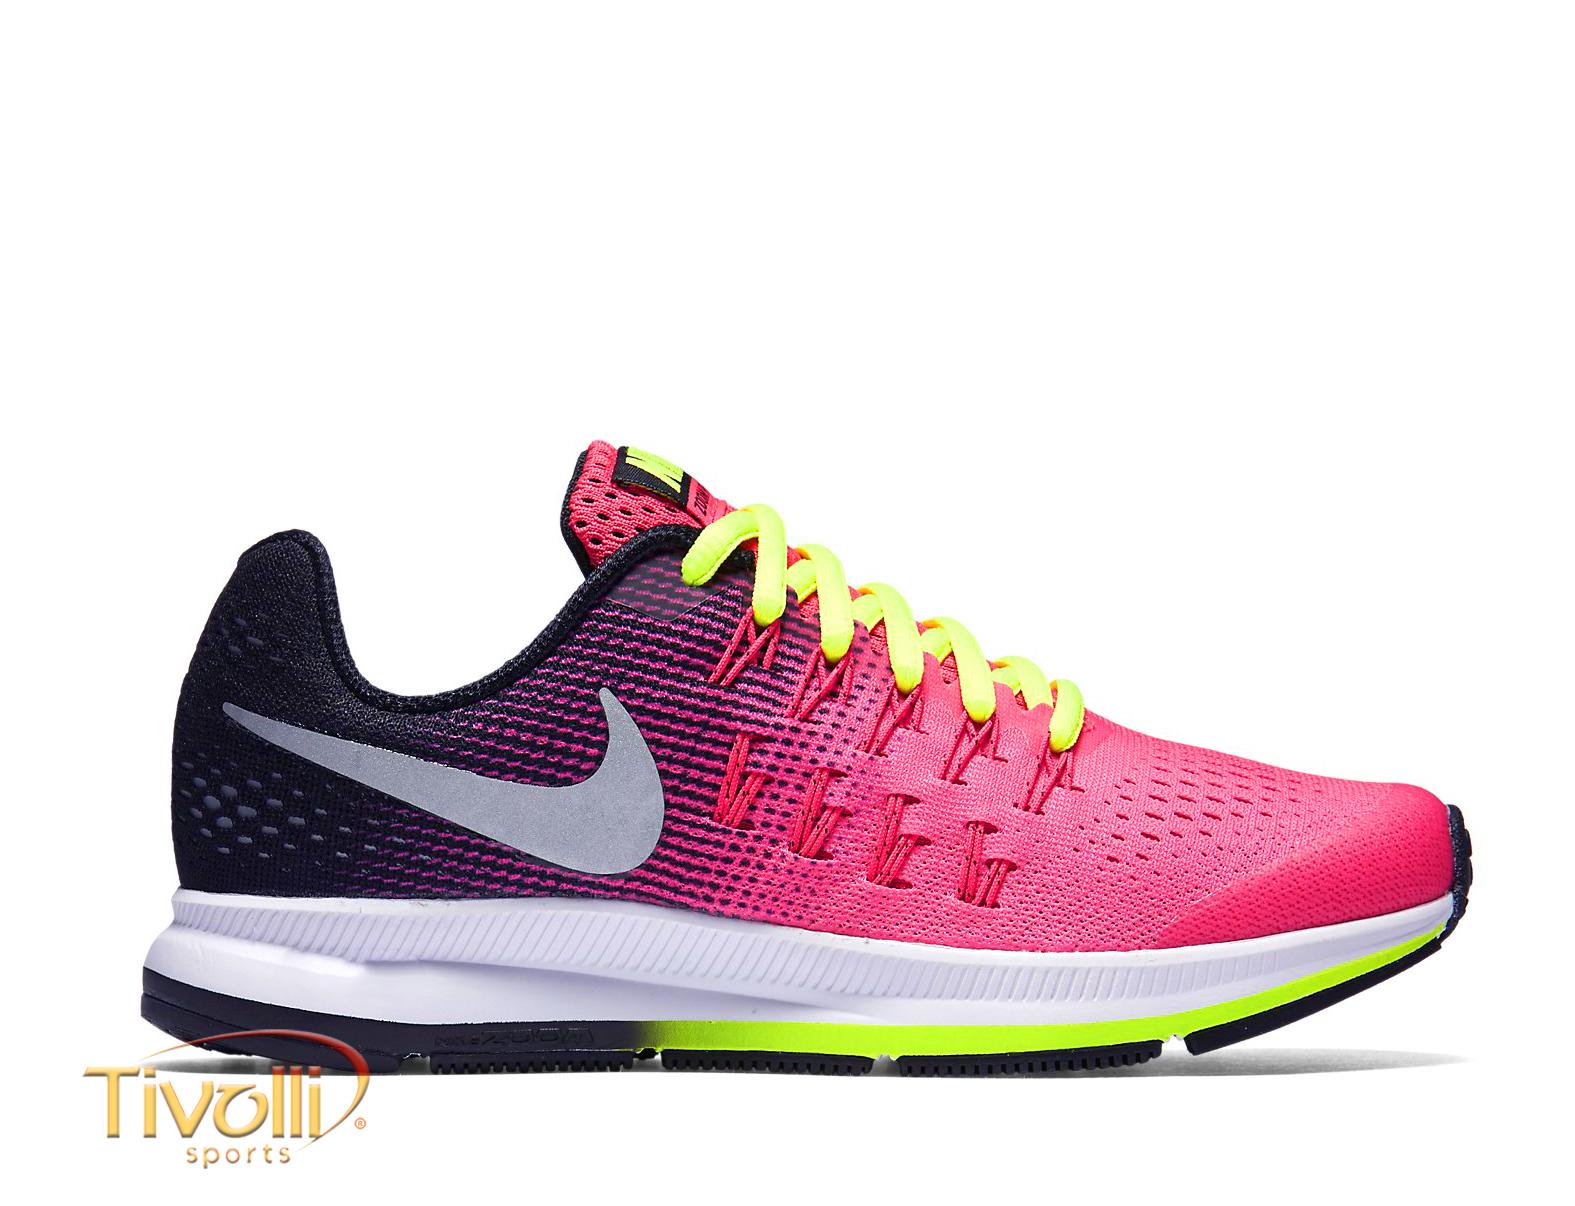 e2fa47e35c3 Tênis Nike Air Zoom Pegasus 33 Feminino   Rosa